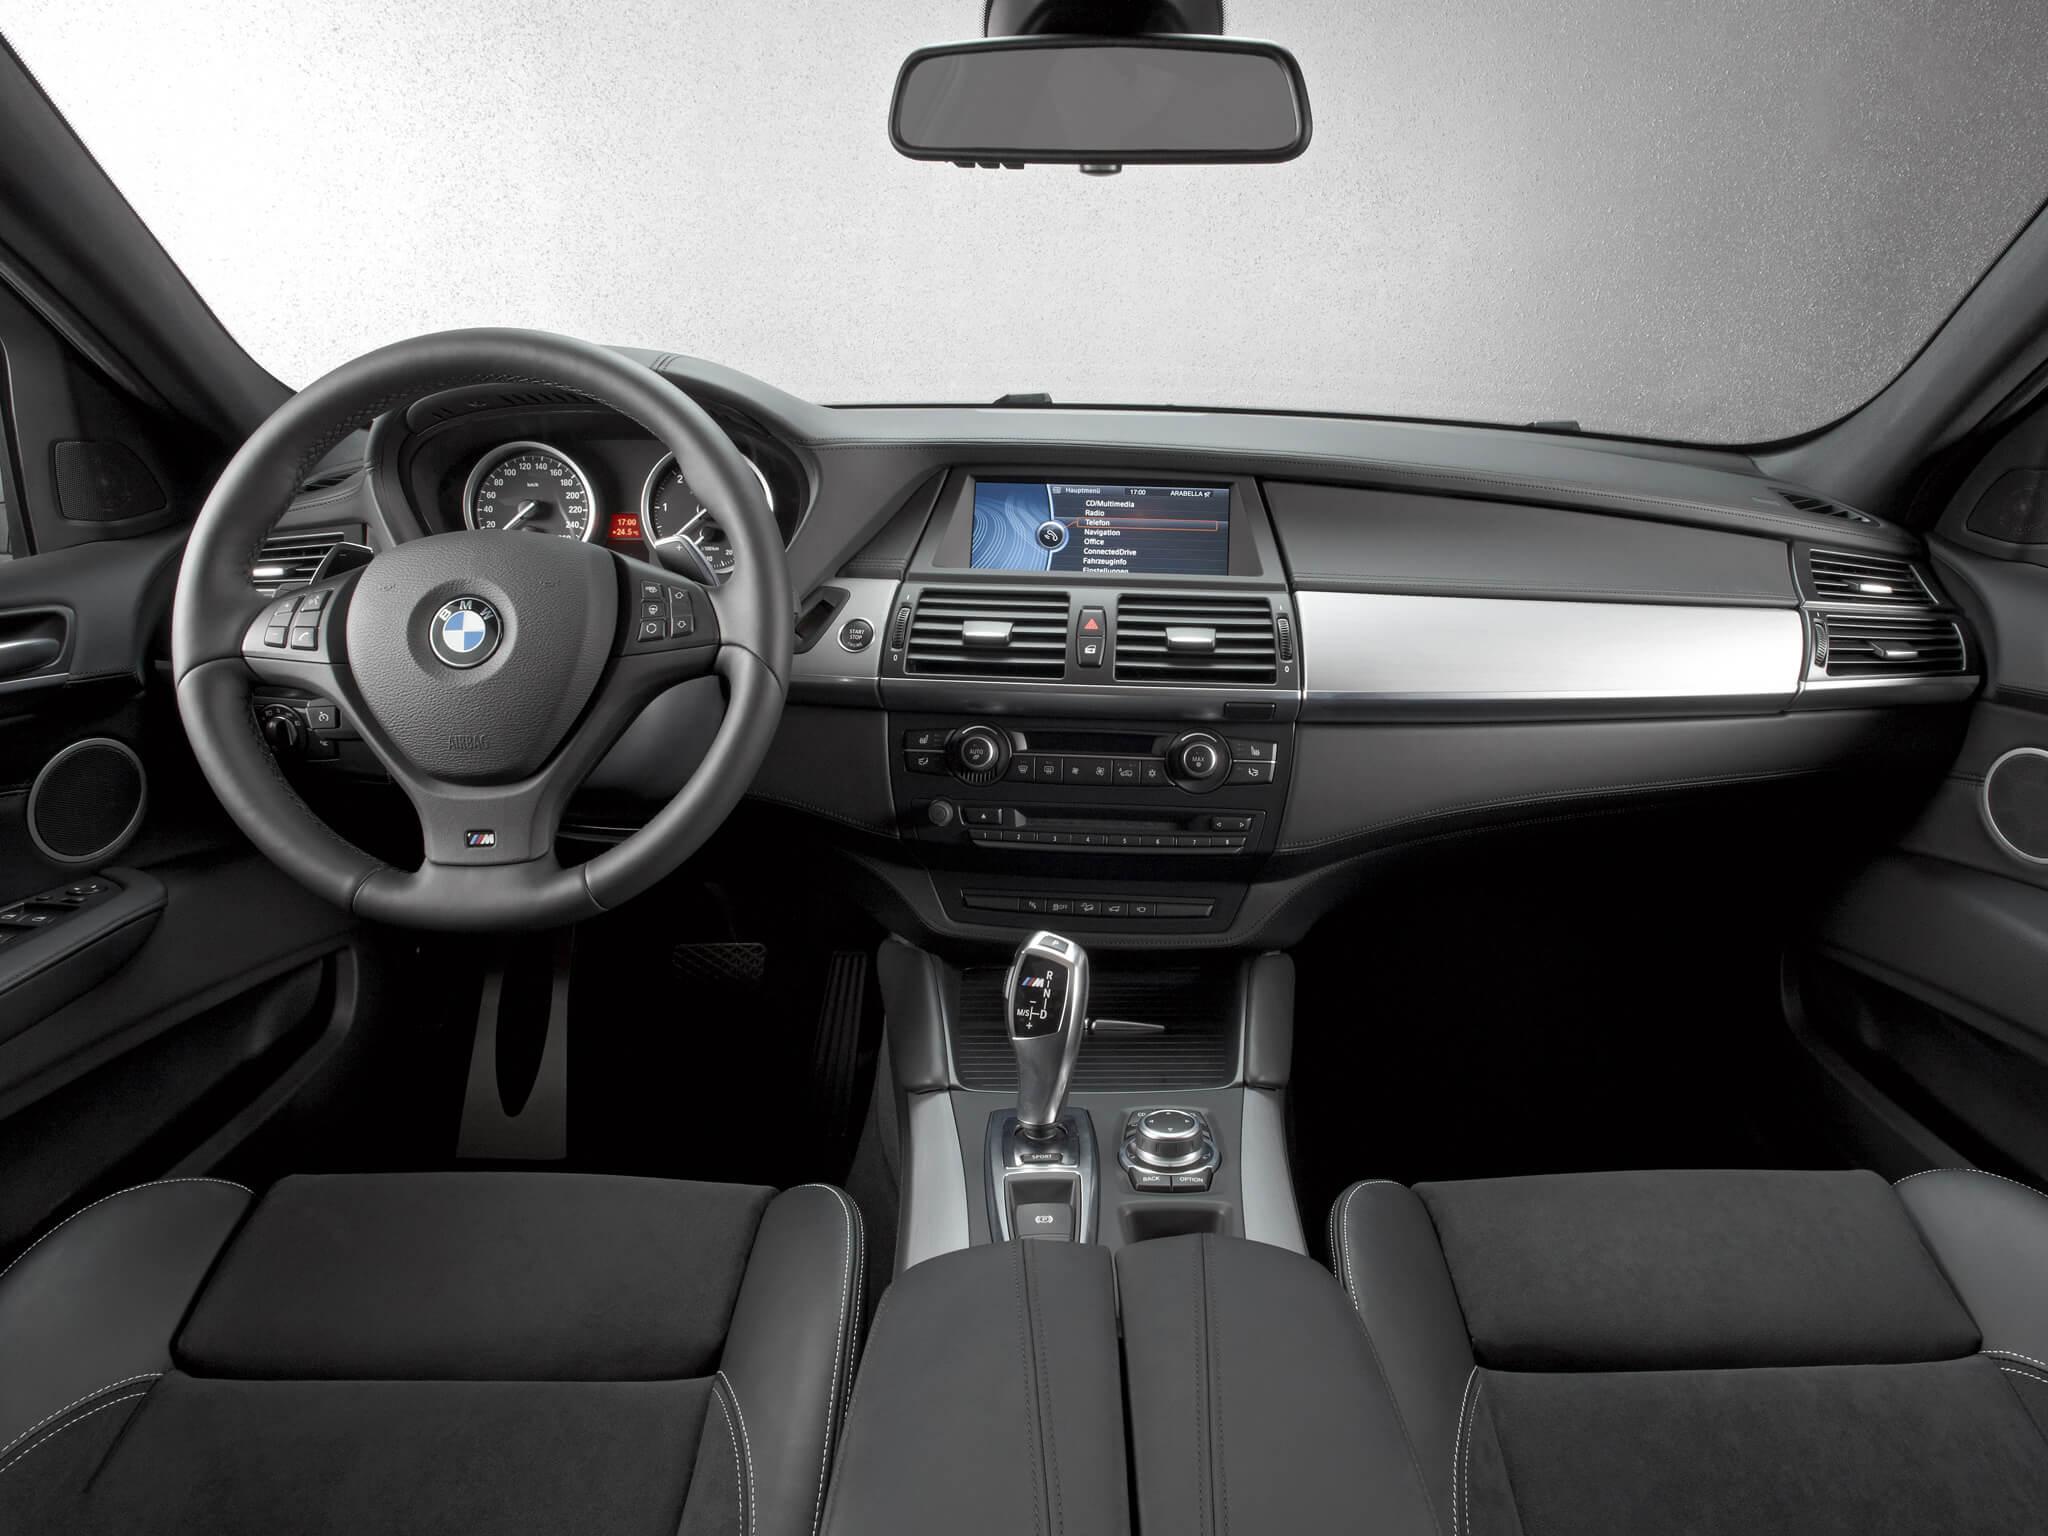 BMW-X6-M-E71-4